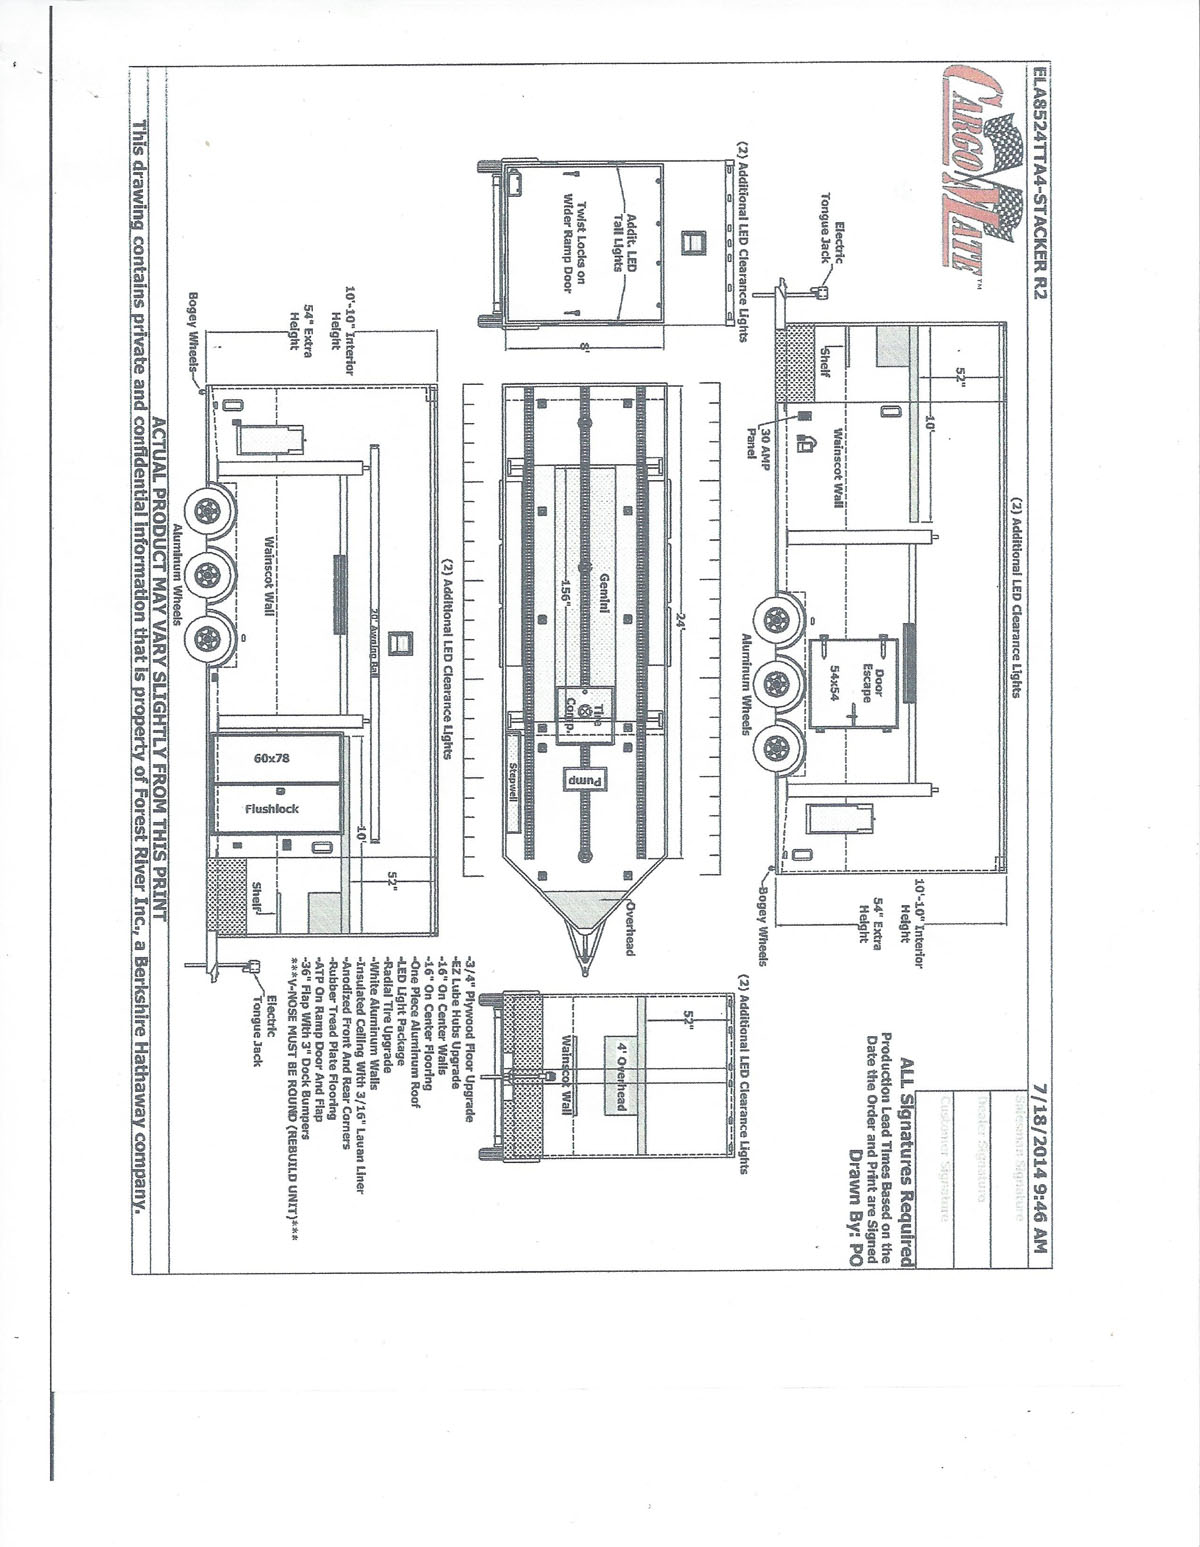 wiring diagram wells cargo trailer wiring diagram trailer wiring